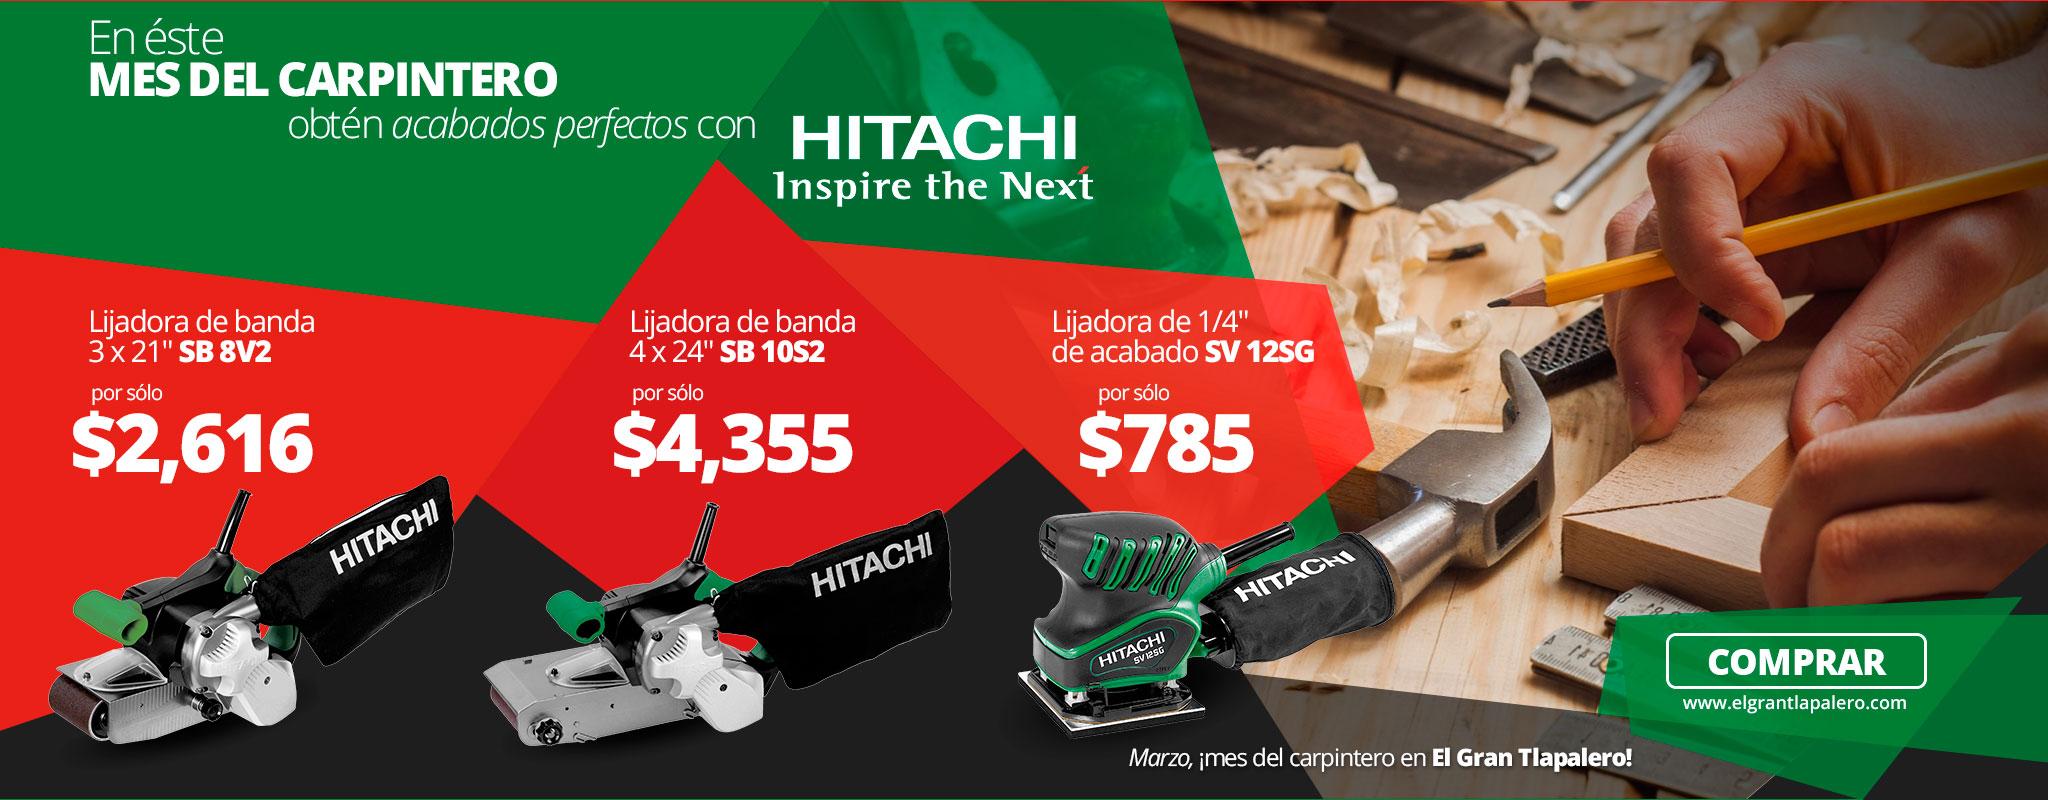 Marzo, mes del carpintero con HITACHI